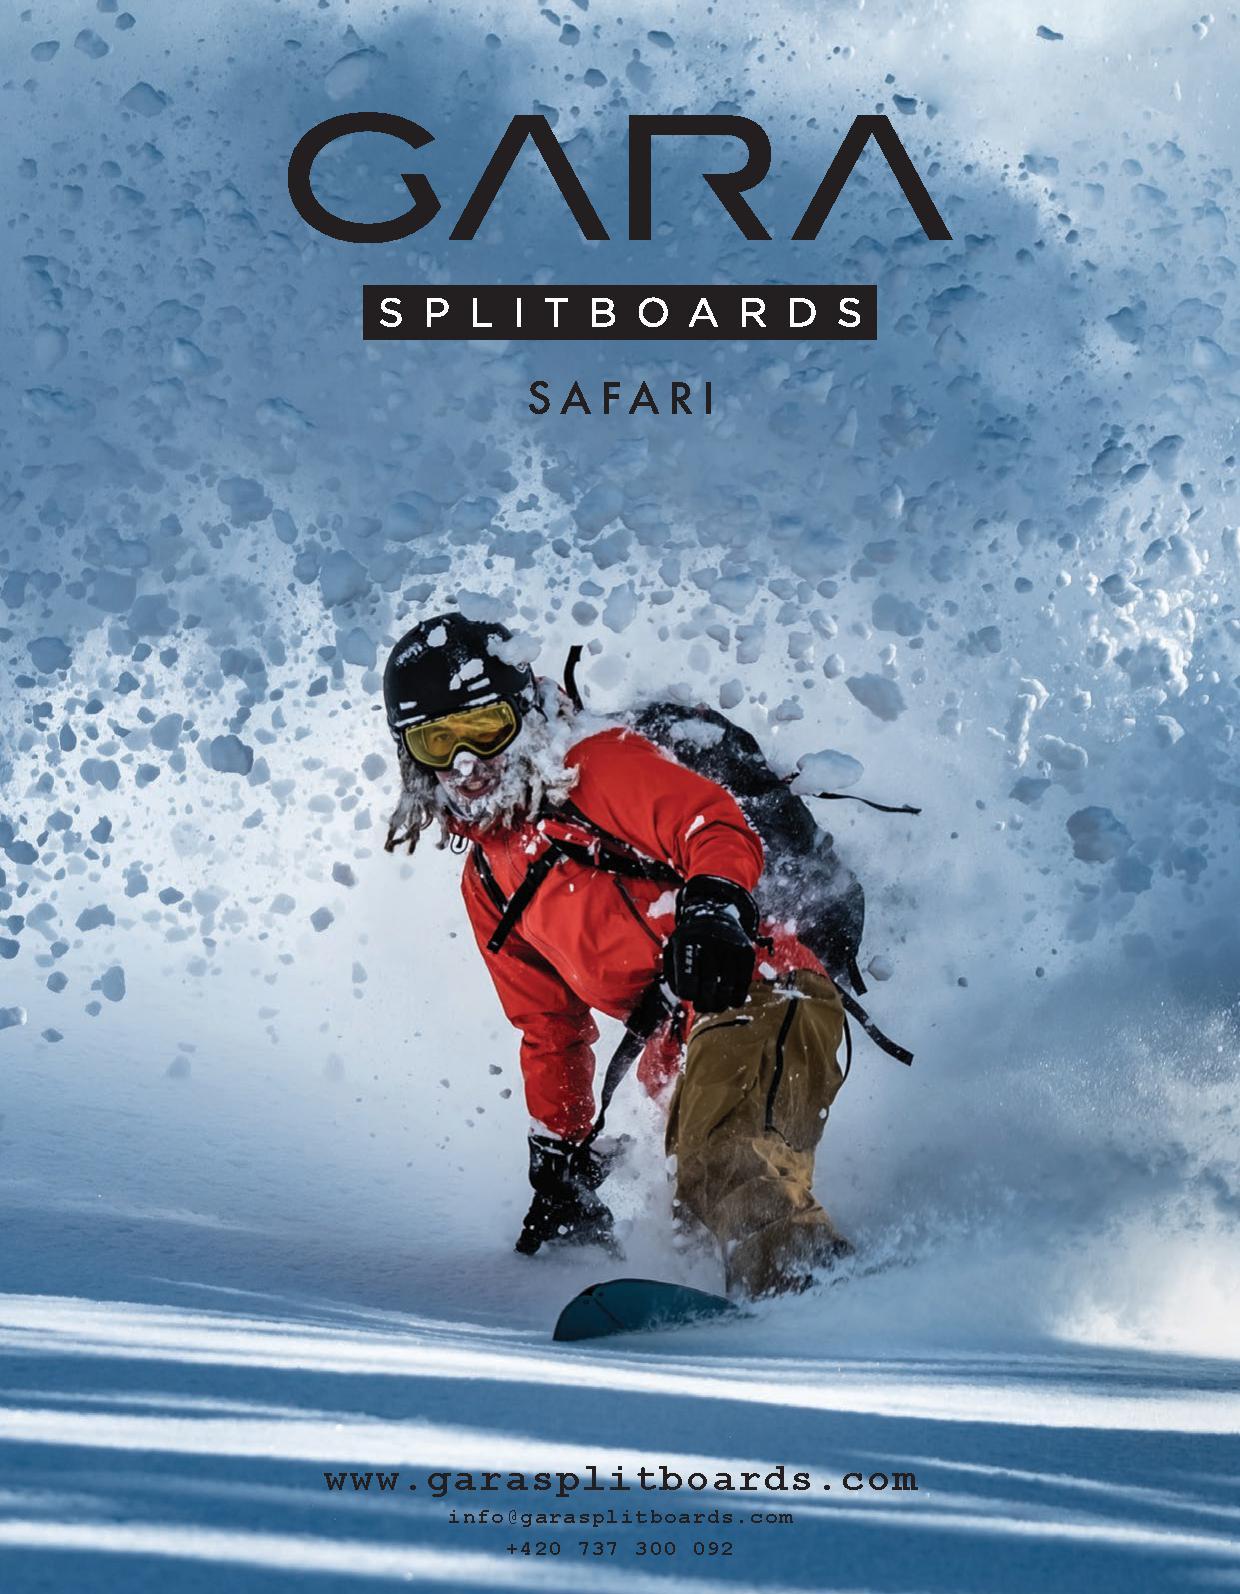 104 gara splitboards